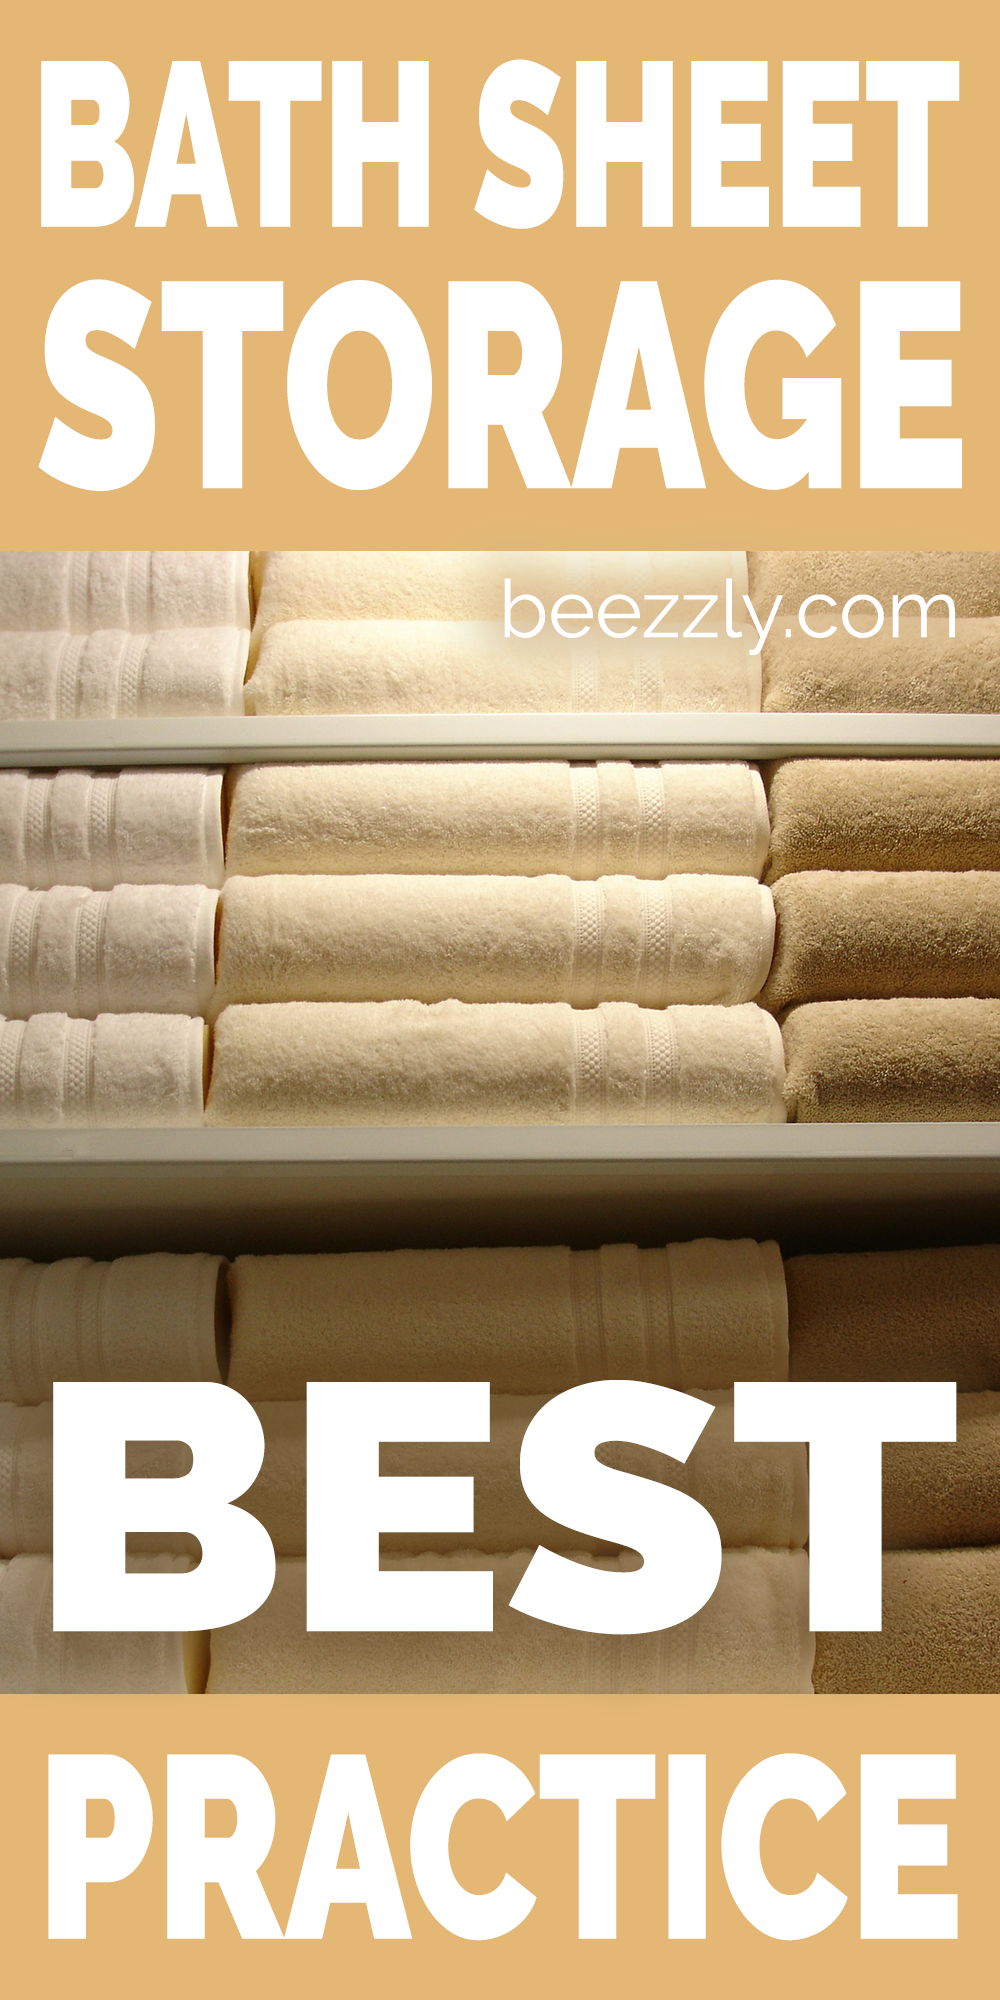 Bath Sheet Storage Best Practice In 2020 Bath Sheets Bath Towels Sheet Storage